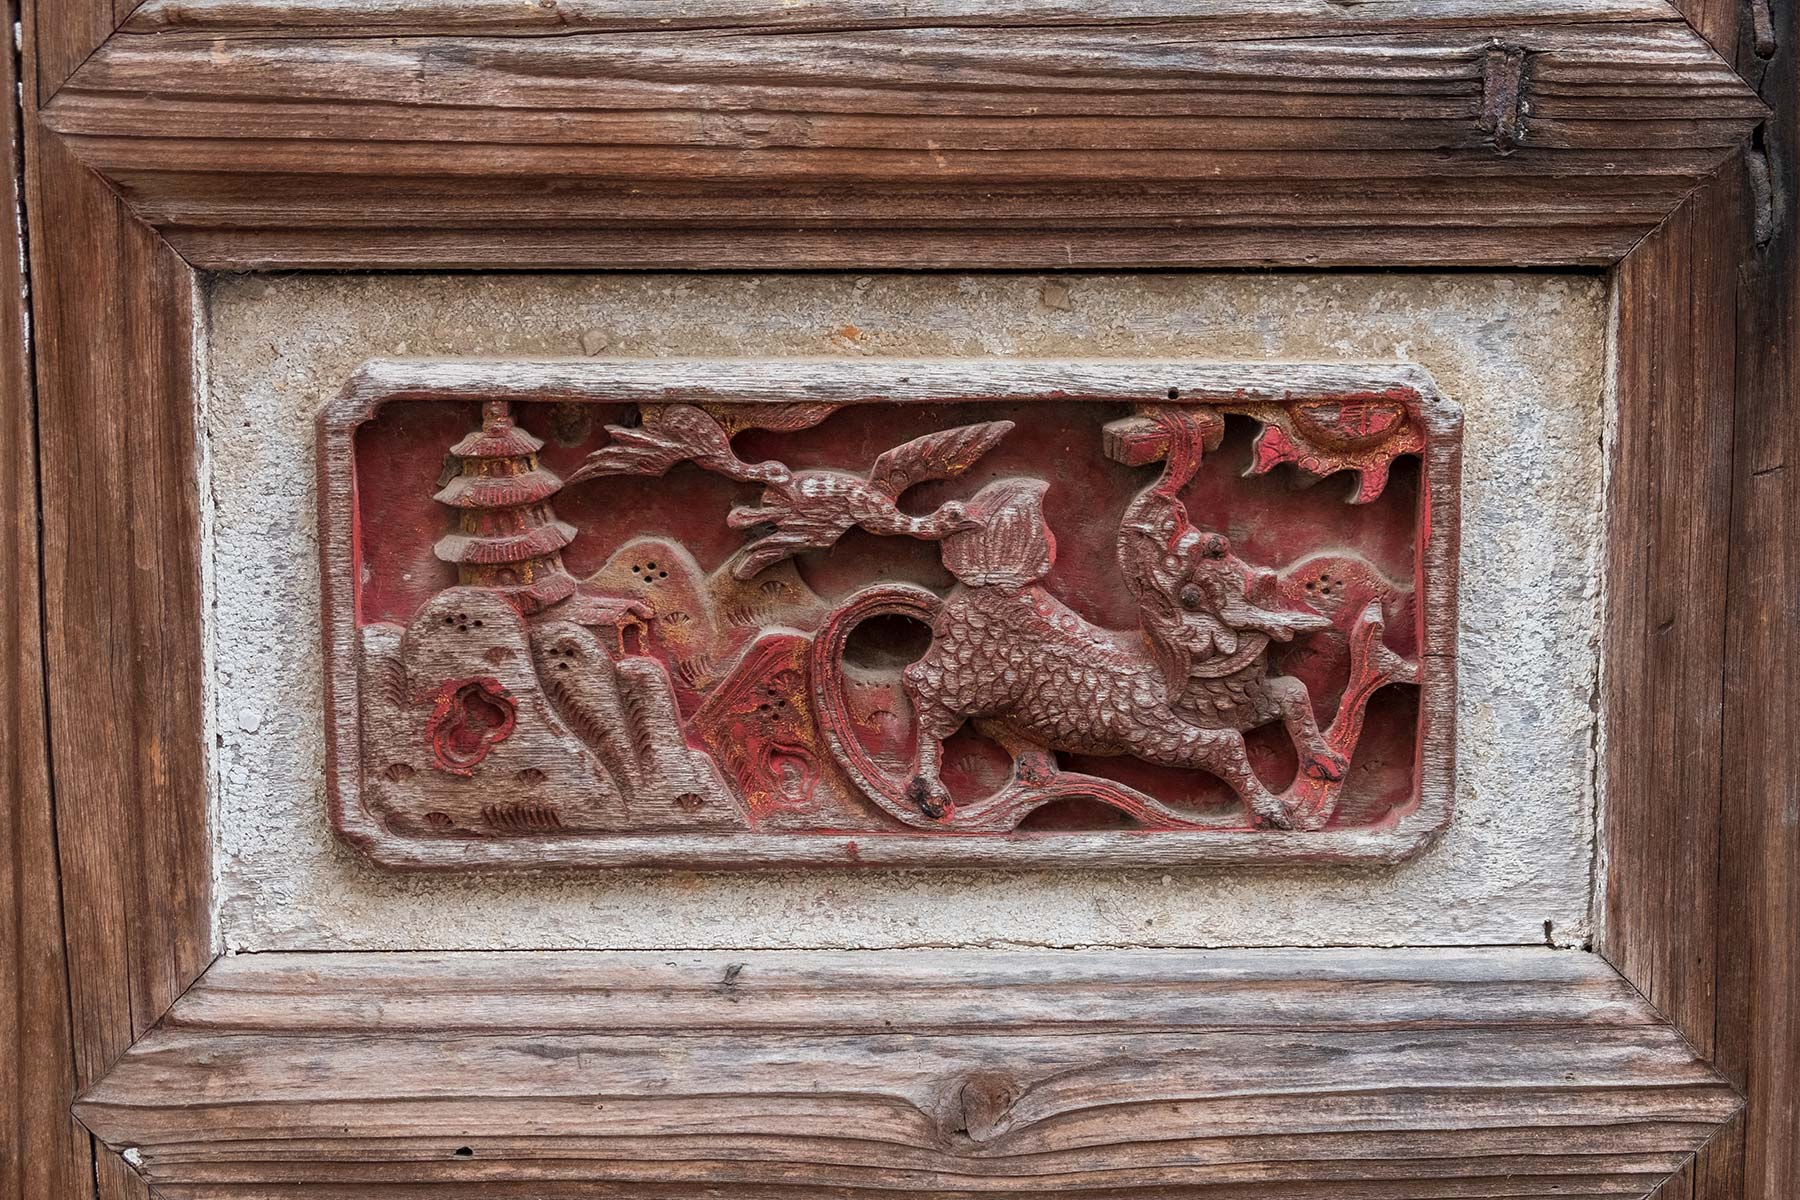 Türschnitzerei in der historischen Altstadt Nanping in Anhui, China